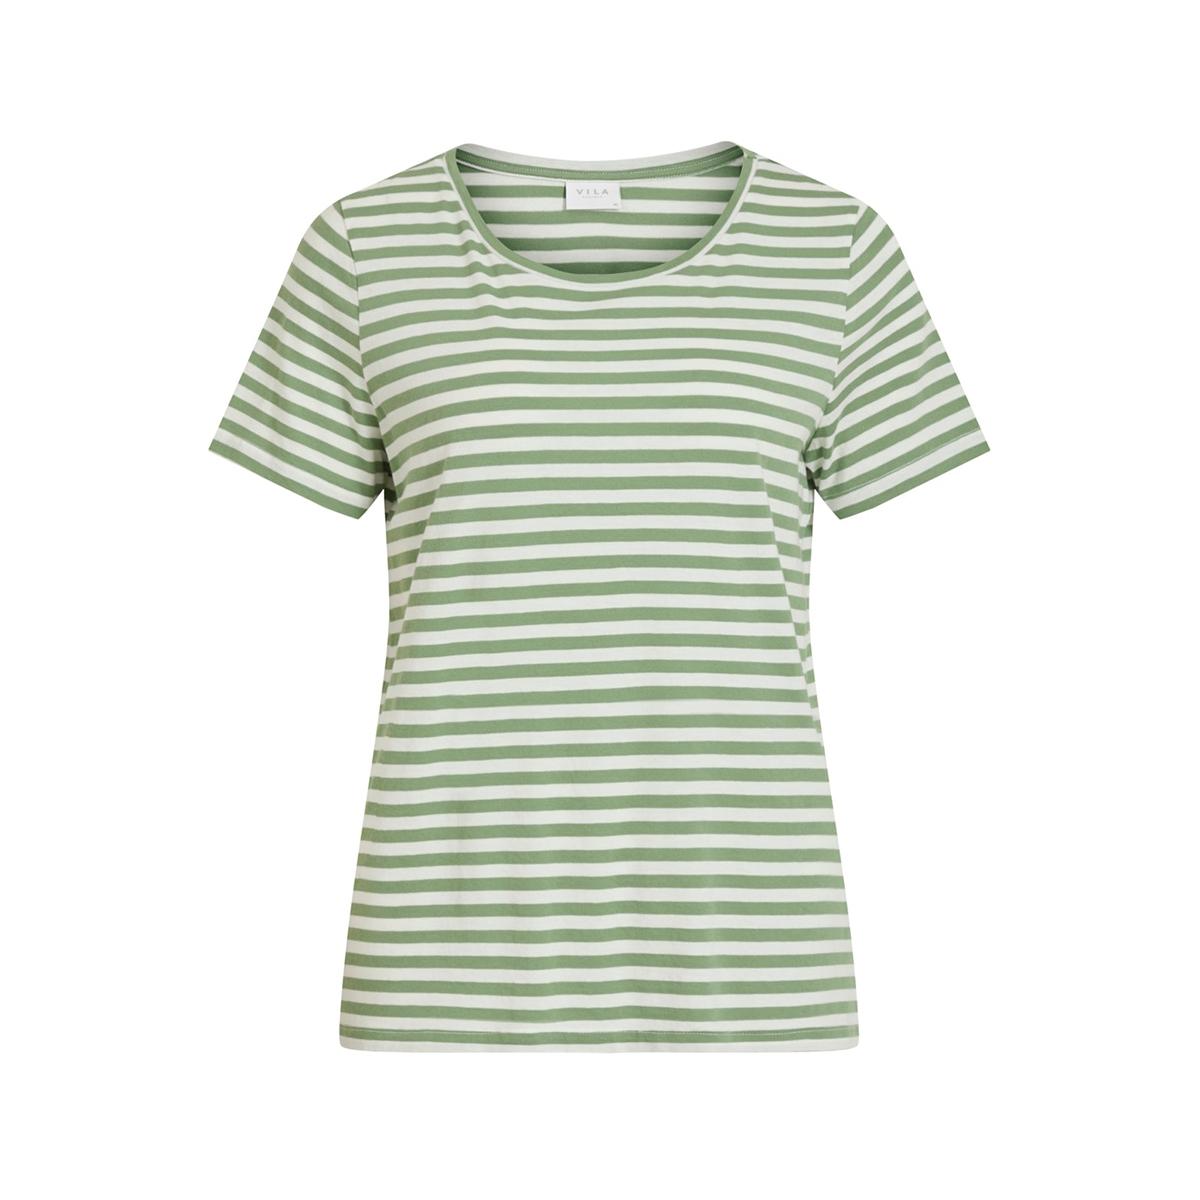 visus o-neck s/s t-shirt/su-fav 14055952 vila t-shirt loden frost/optical snow